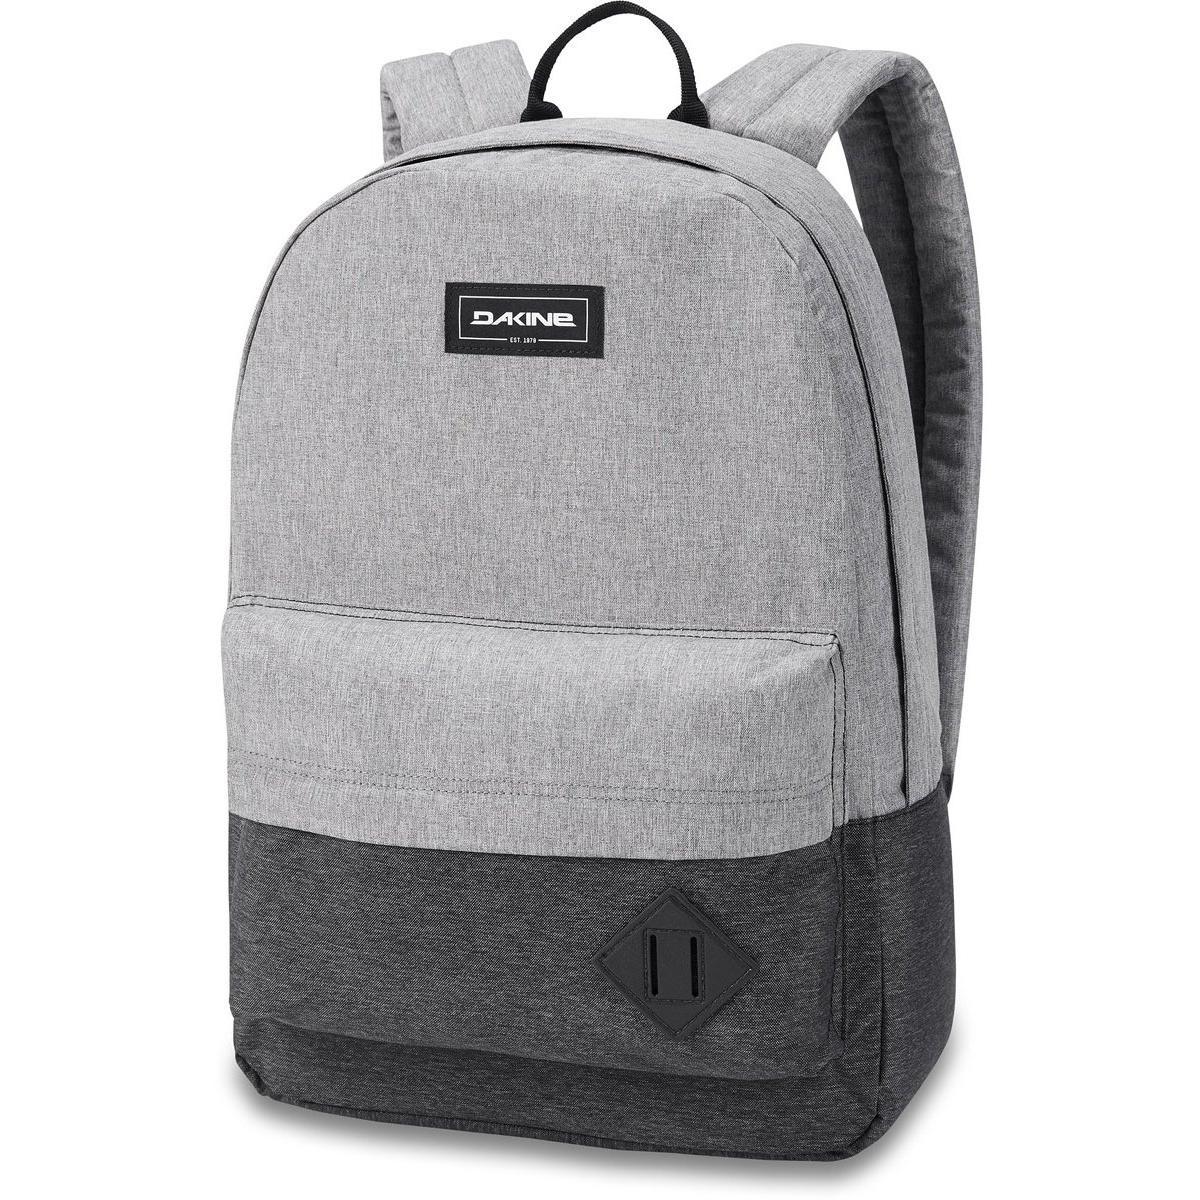 Рюкзак Dakine 365 Pack 21L (Greyscale)